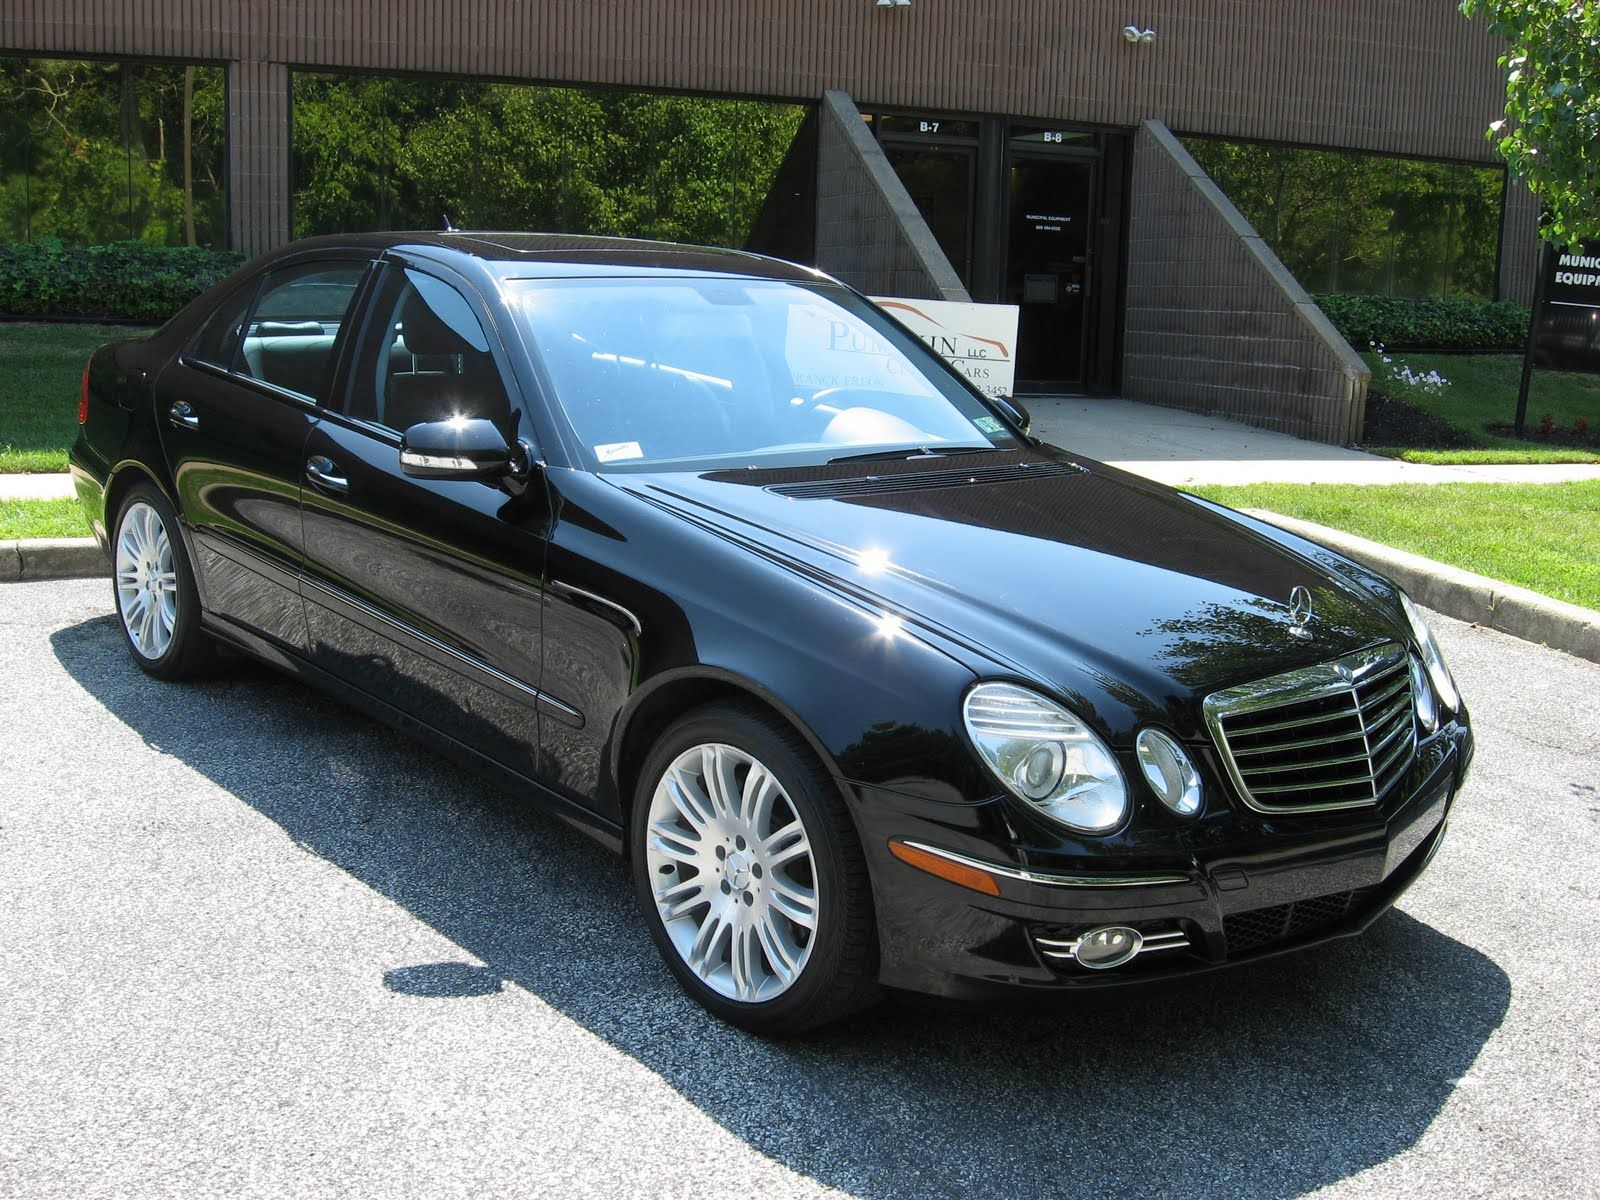 2007 mercedes benz e350 4matic cars pinterest mercedes benz e350 mercedes benz and benz. Black Bedroom Furniture Sets. Home Design Ideas